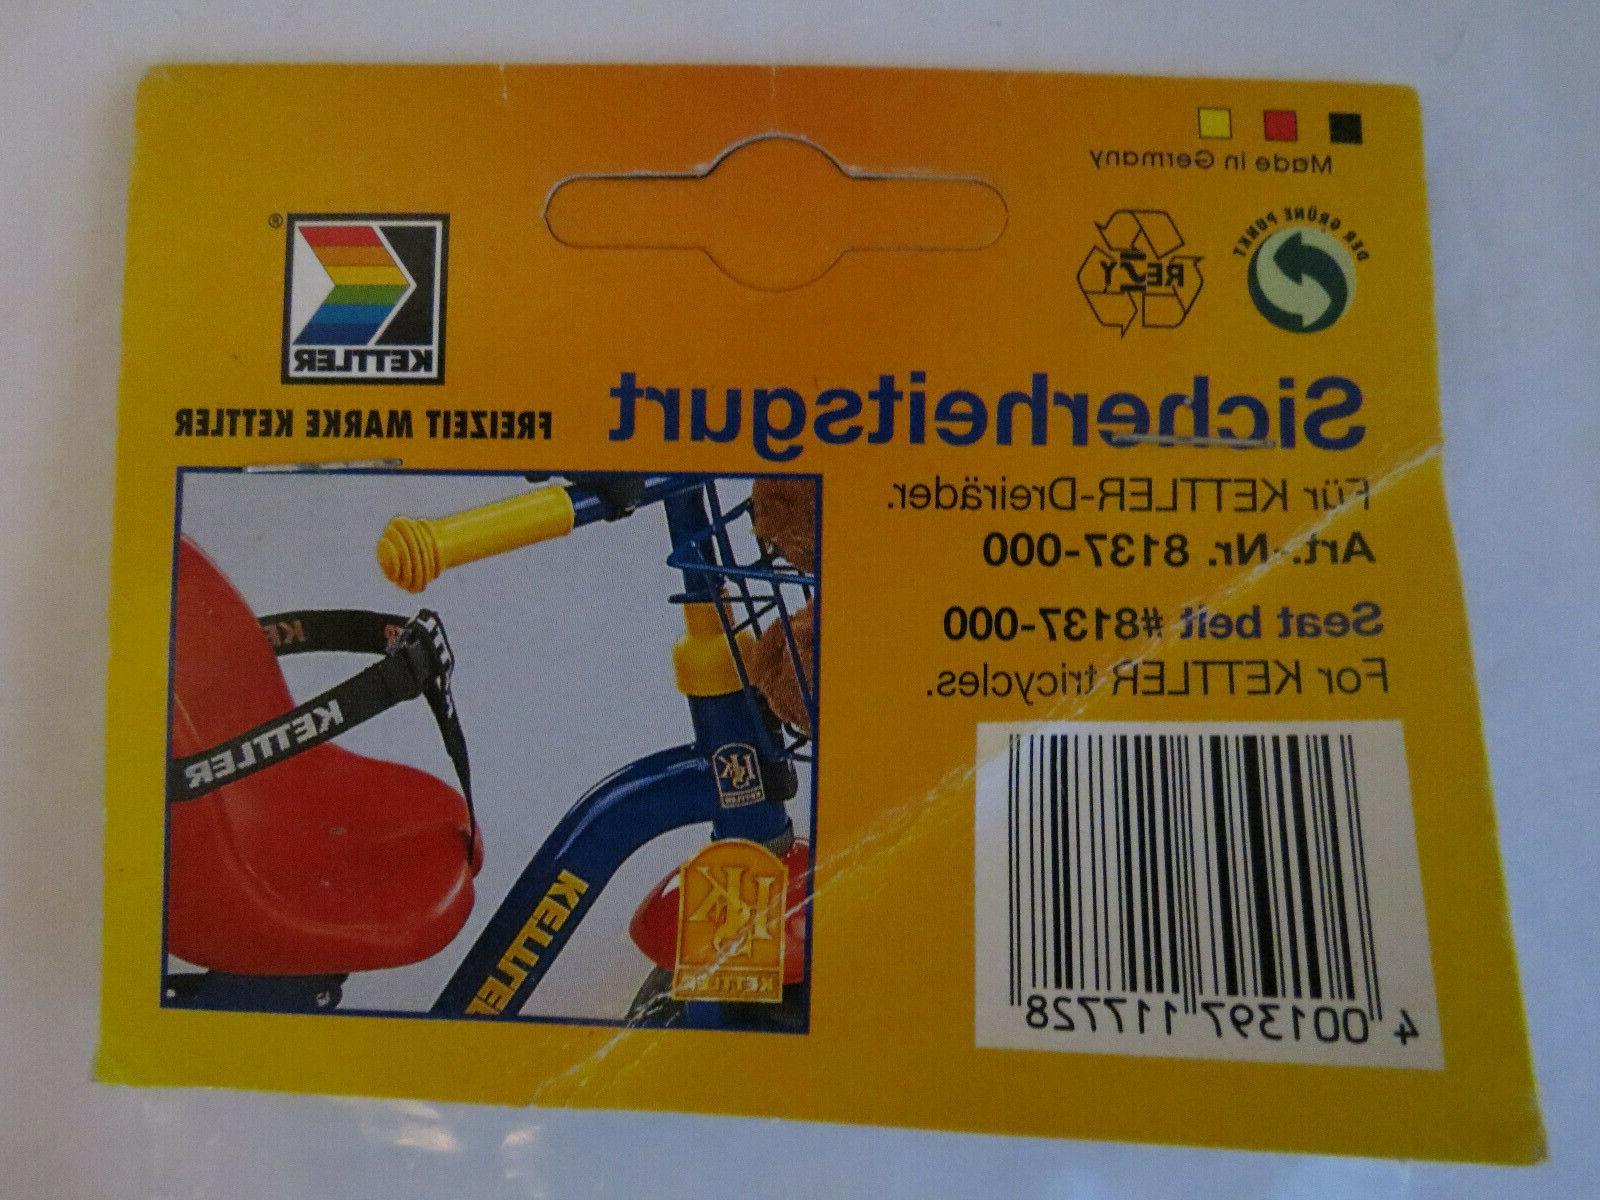 Kettler Seat Belt Kettler tricycle